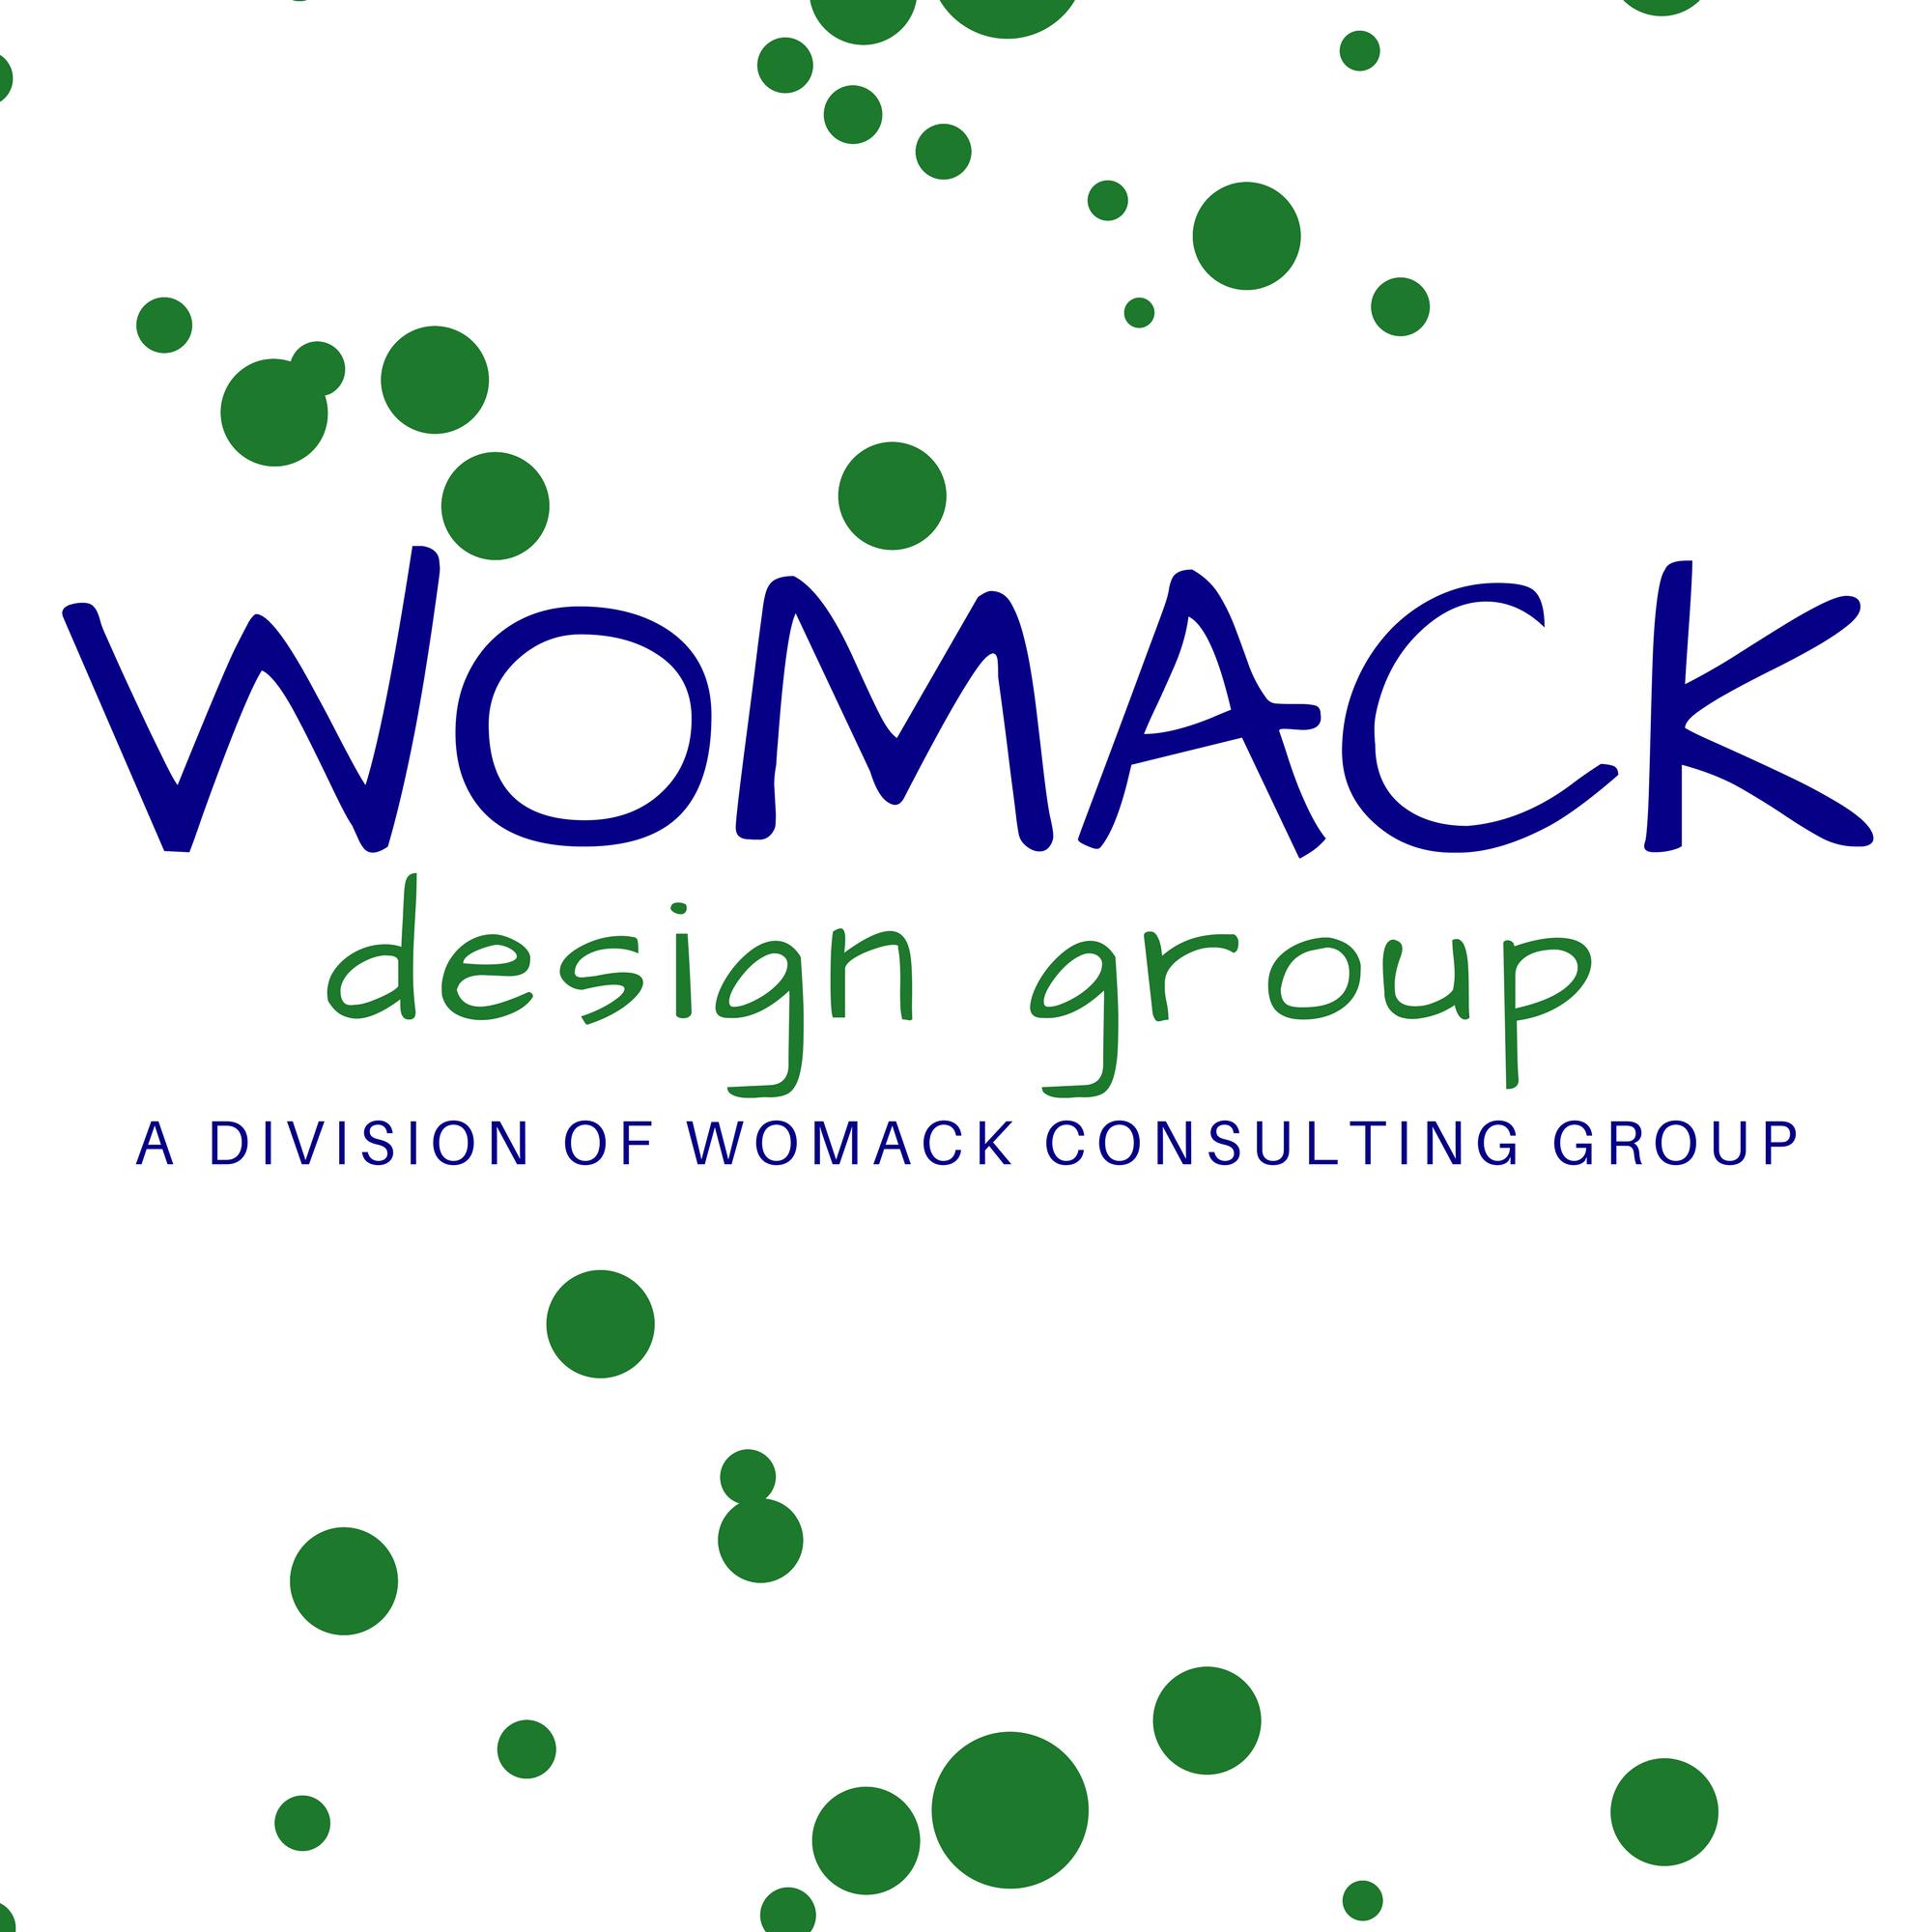 WomackDesignGroup.png